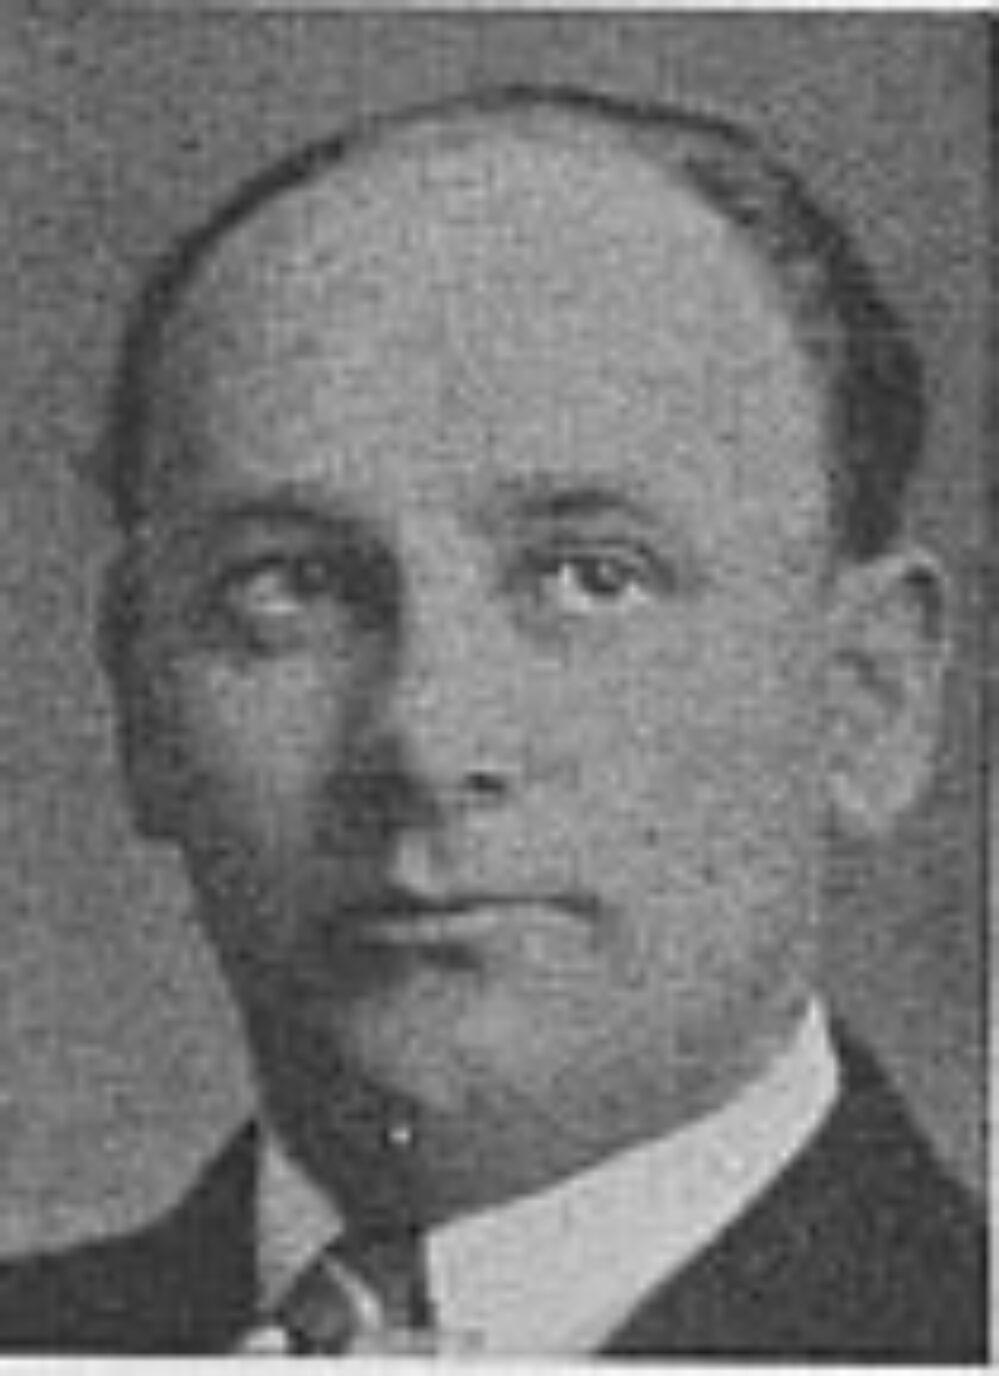 John Wilborn Berner